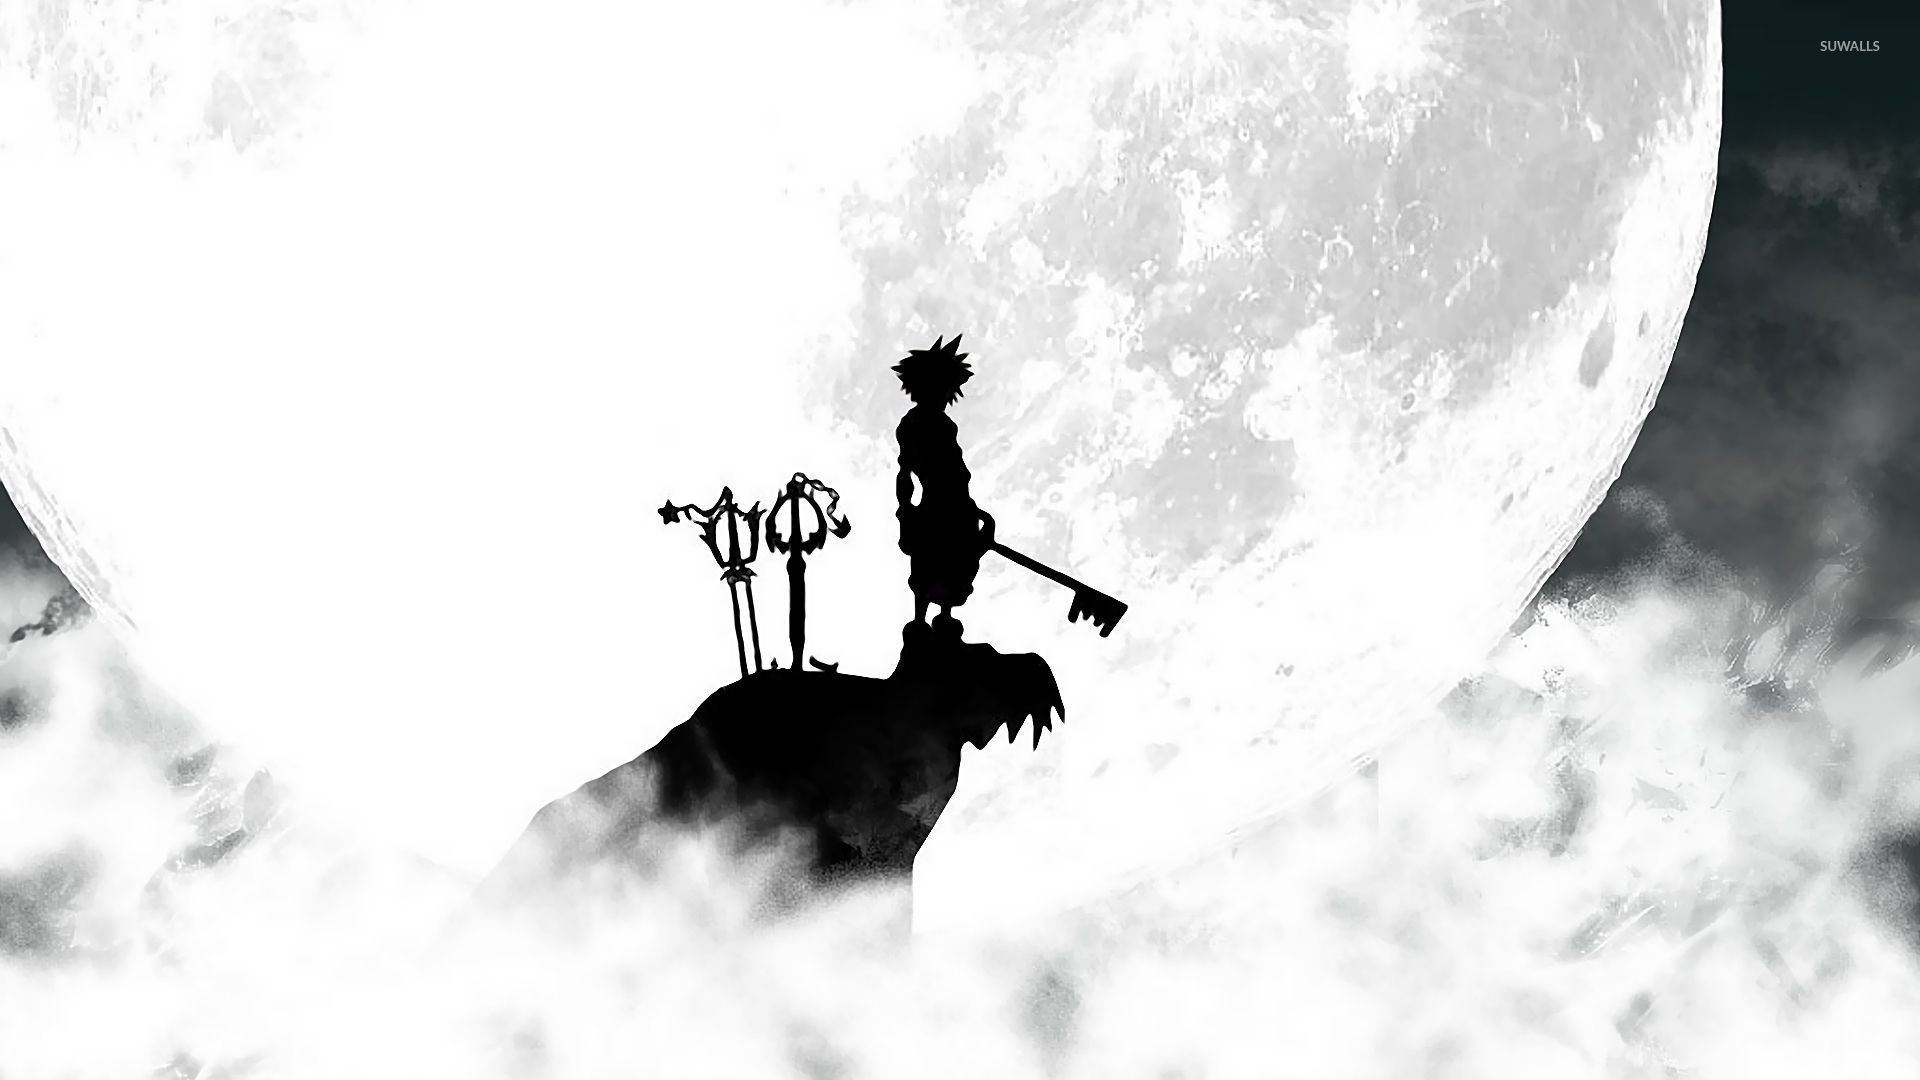 Kingdom Hearts Wallpaper 78 Images